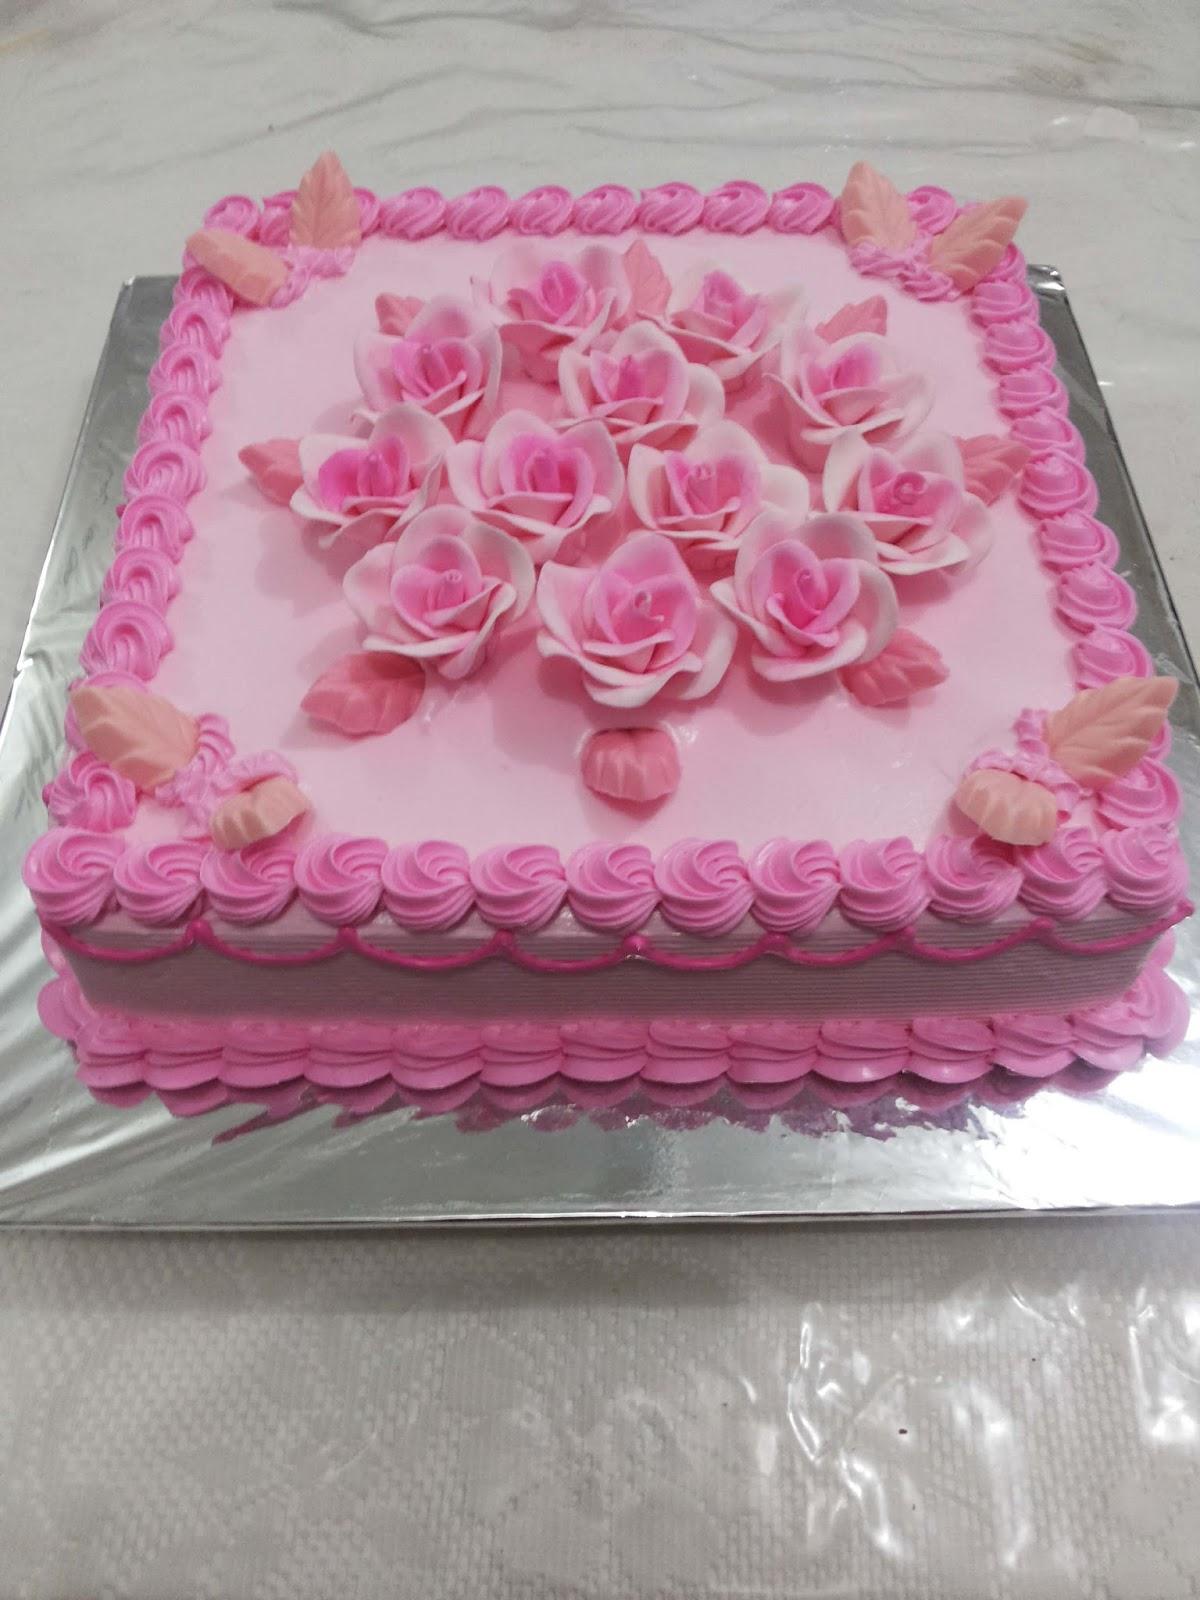 Gambar Bunga Mawar Dan Kue Ulang Tahun Pickini